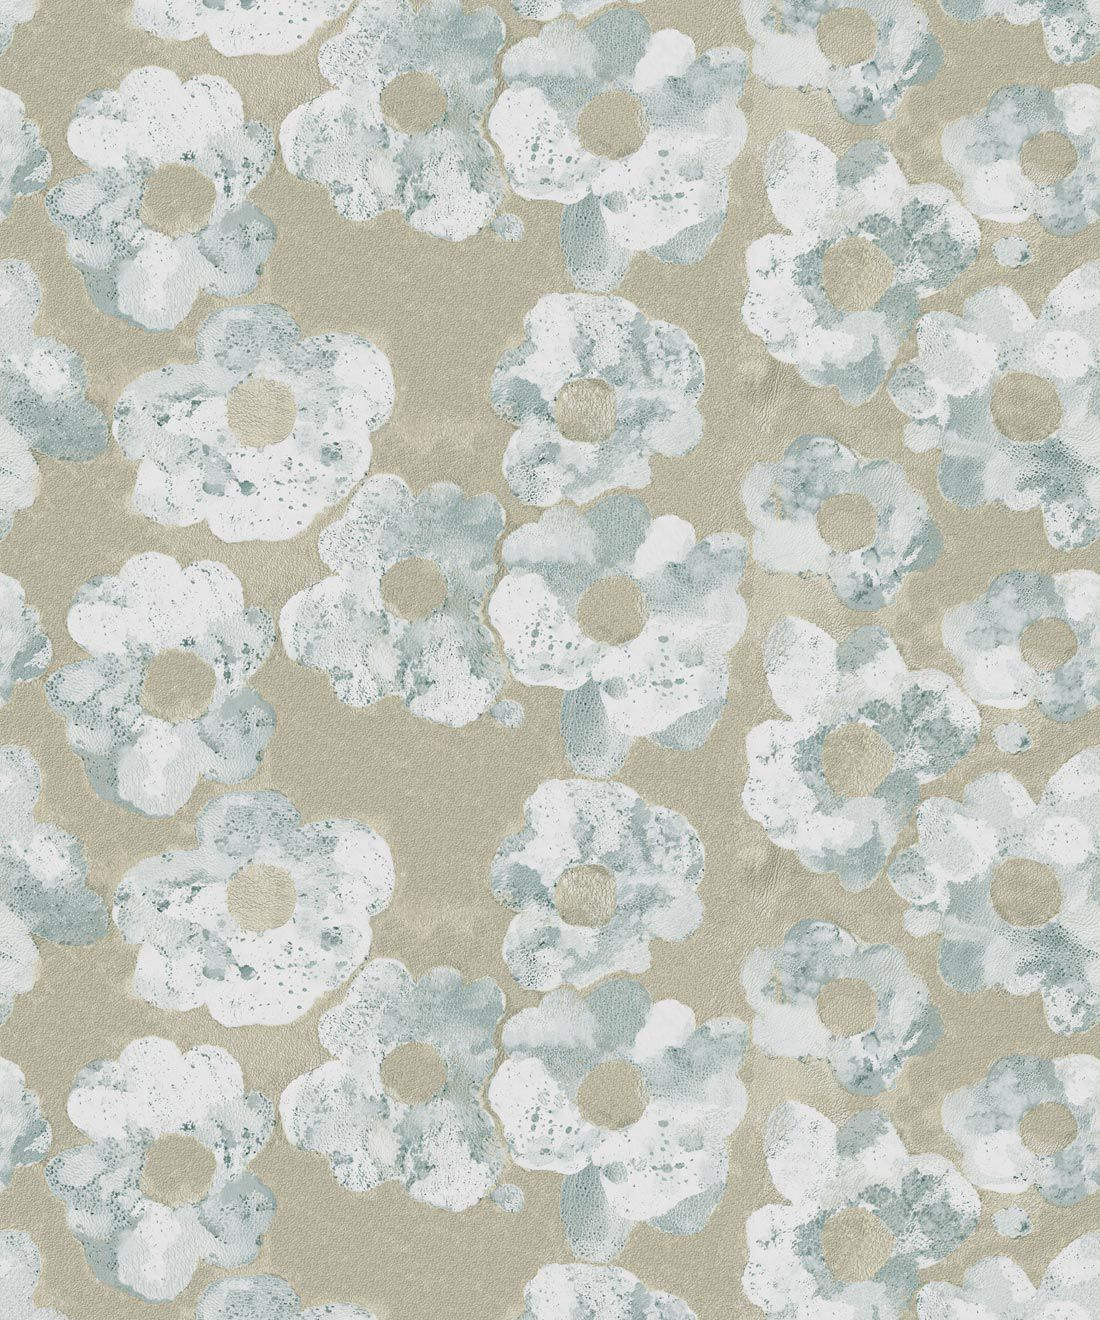 Cherry Blossom Wallpaper Bronze • Shibori Floral • Swatch